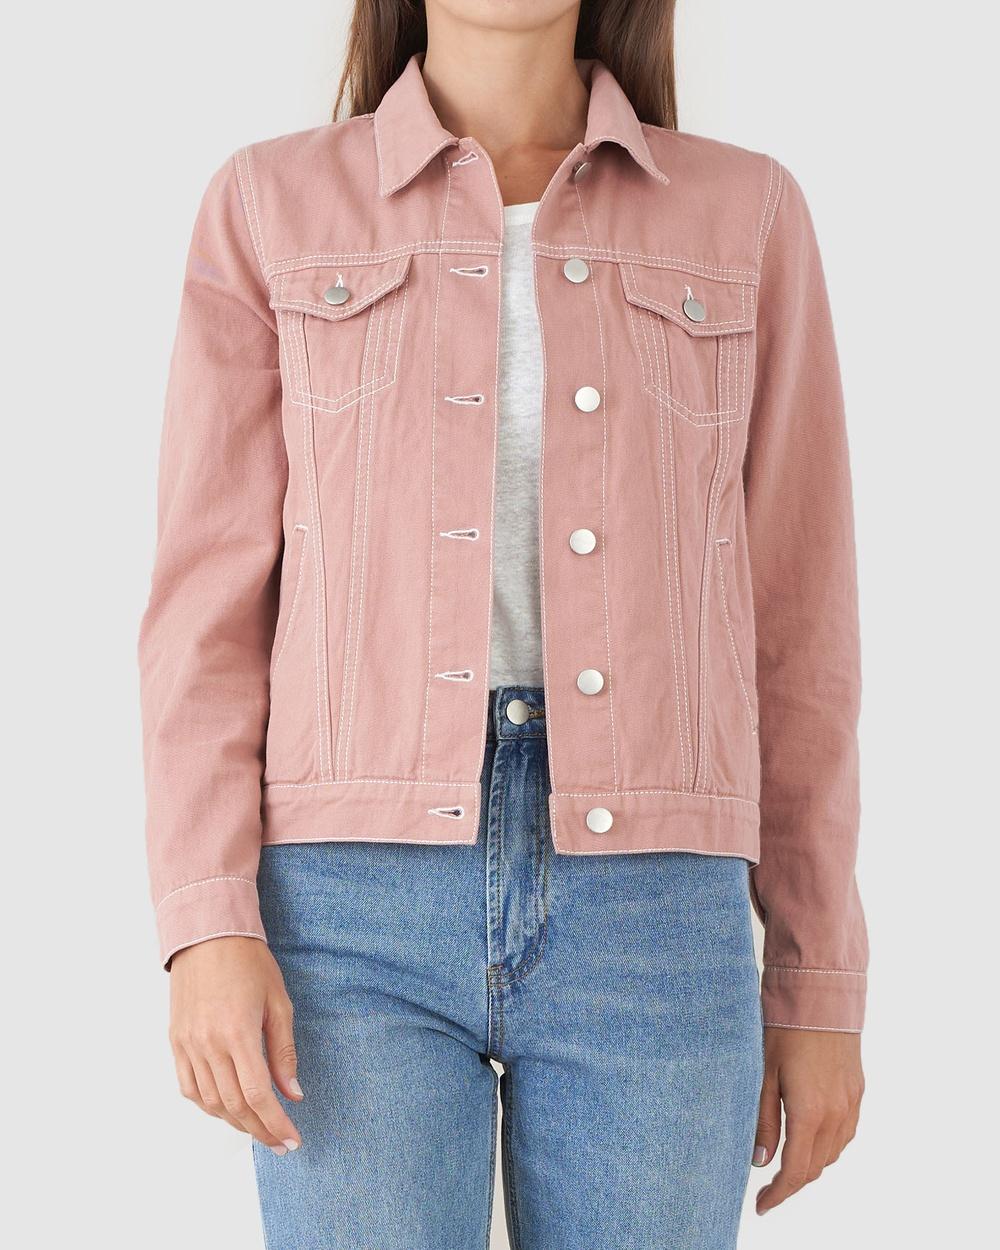 Amelius Alliance Drill Denim Jacket jacket Pink Australia